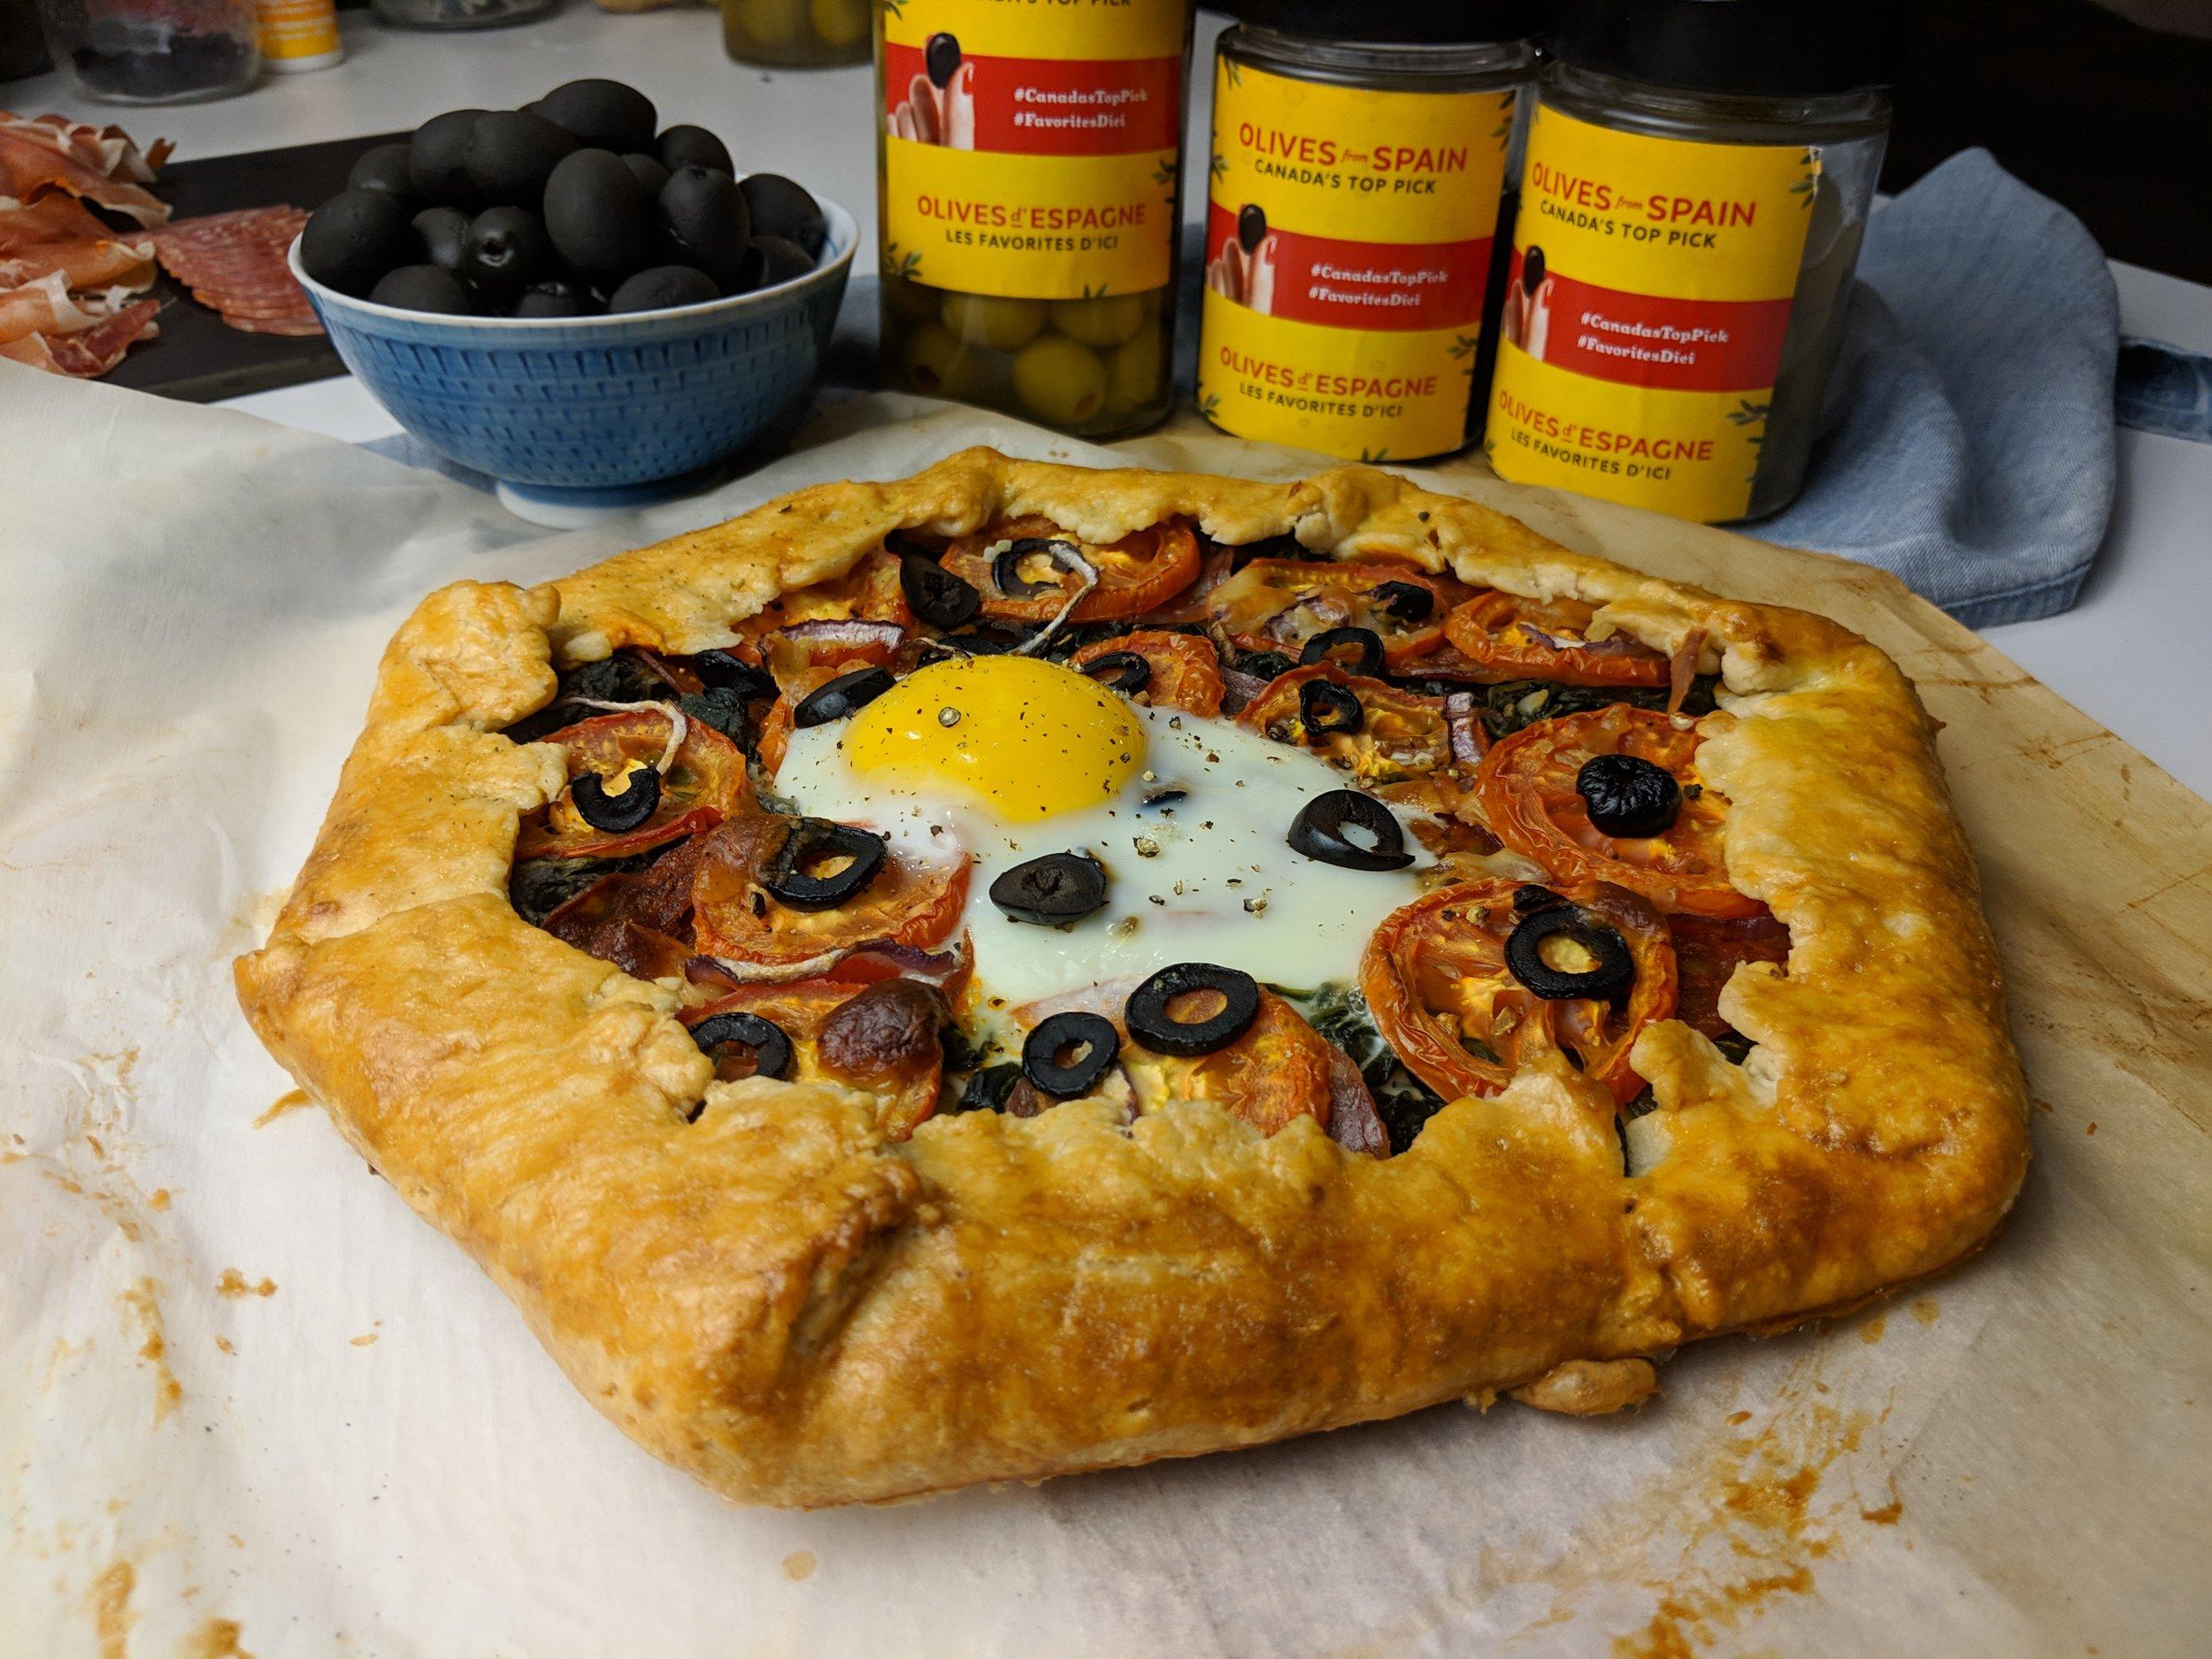 olives from spain breakfast tart hojiblanca